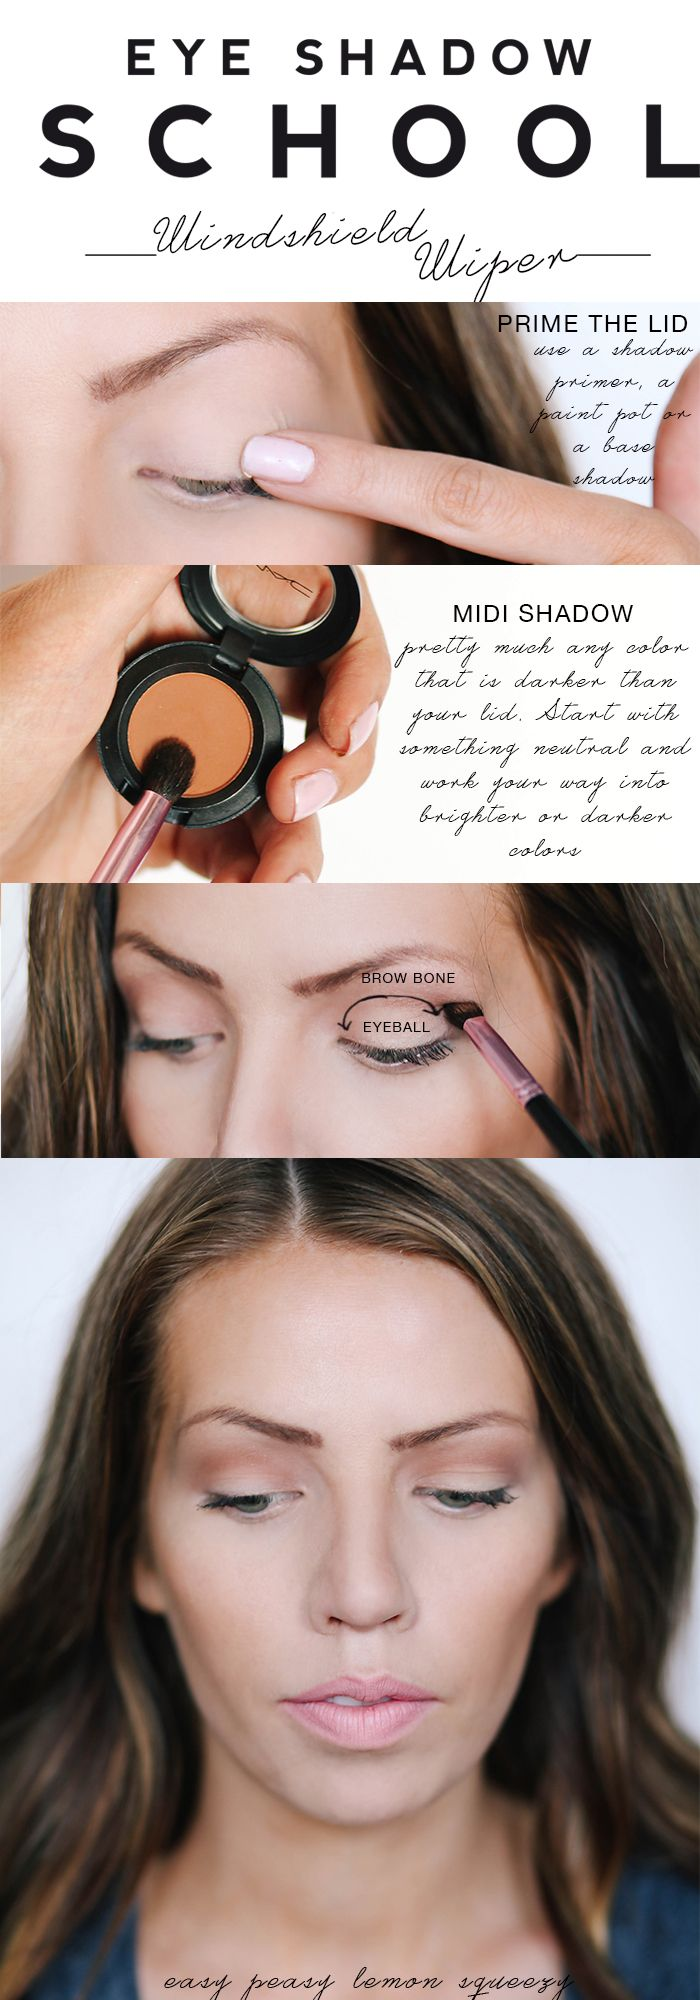 Eyeshadow School: Windshield Wiper